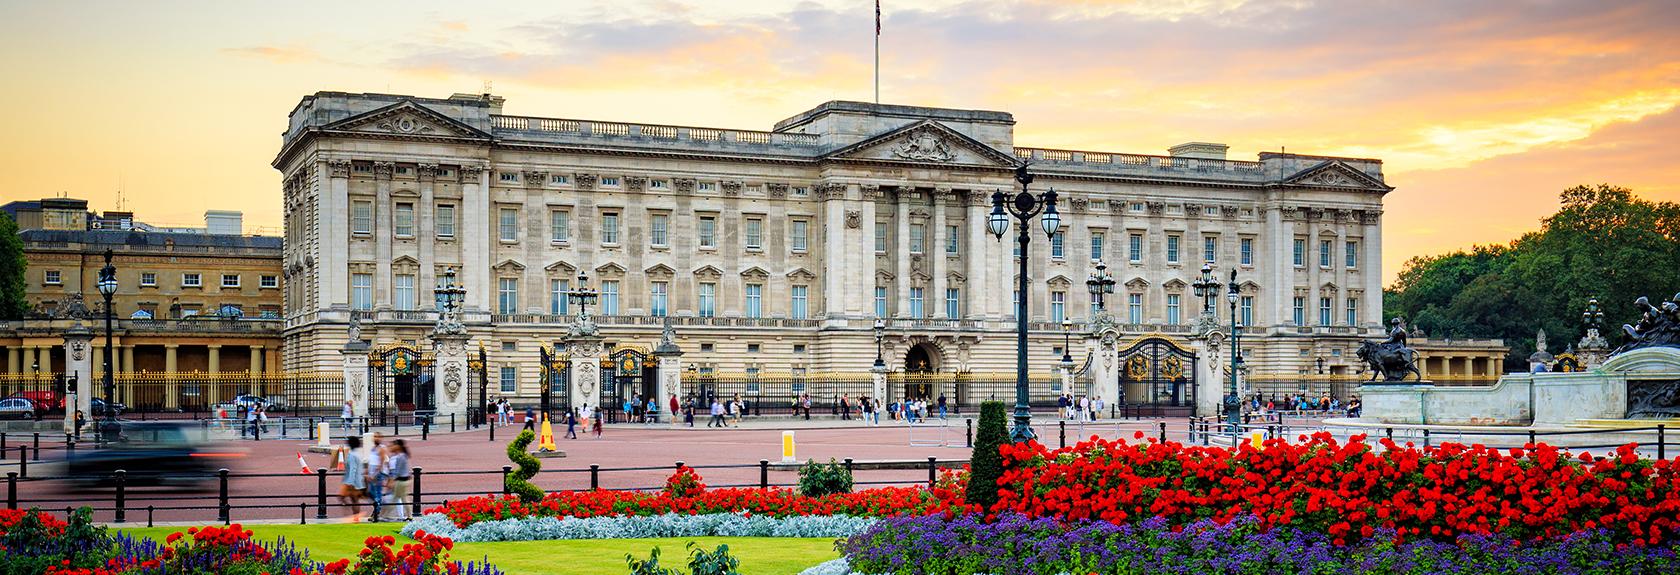 Dagtour Buckingham Palace & Windsor Castle